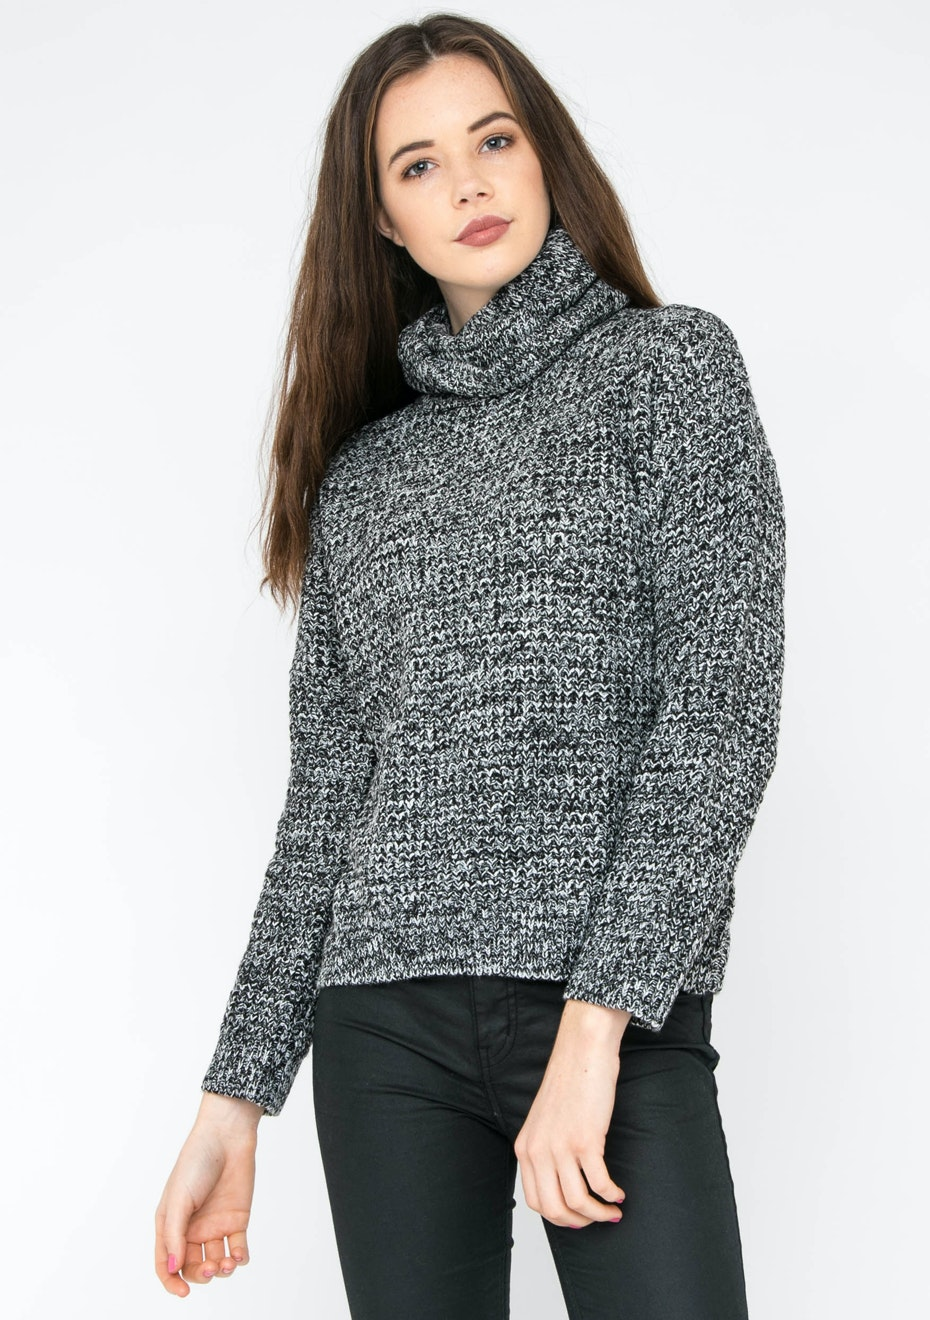 MINKPINK - Static Waffle Sweater - Black/White